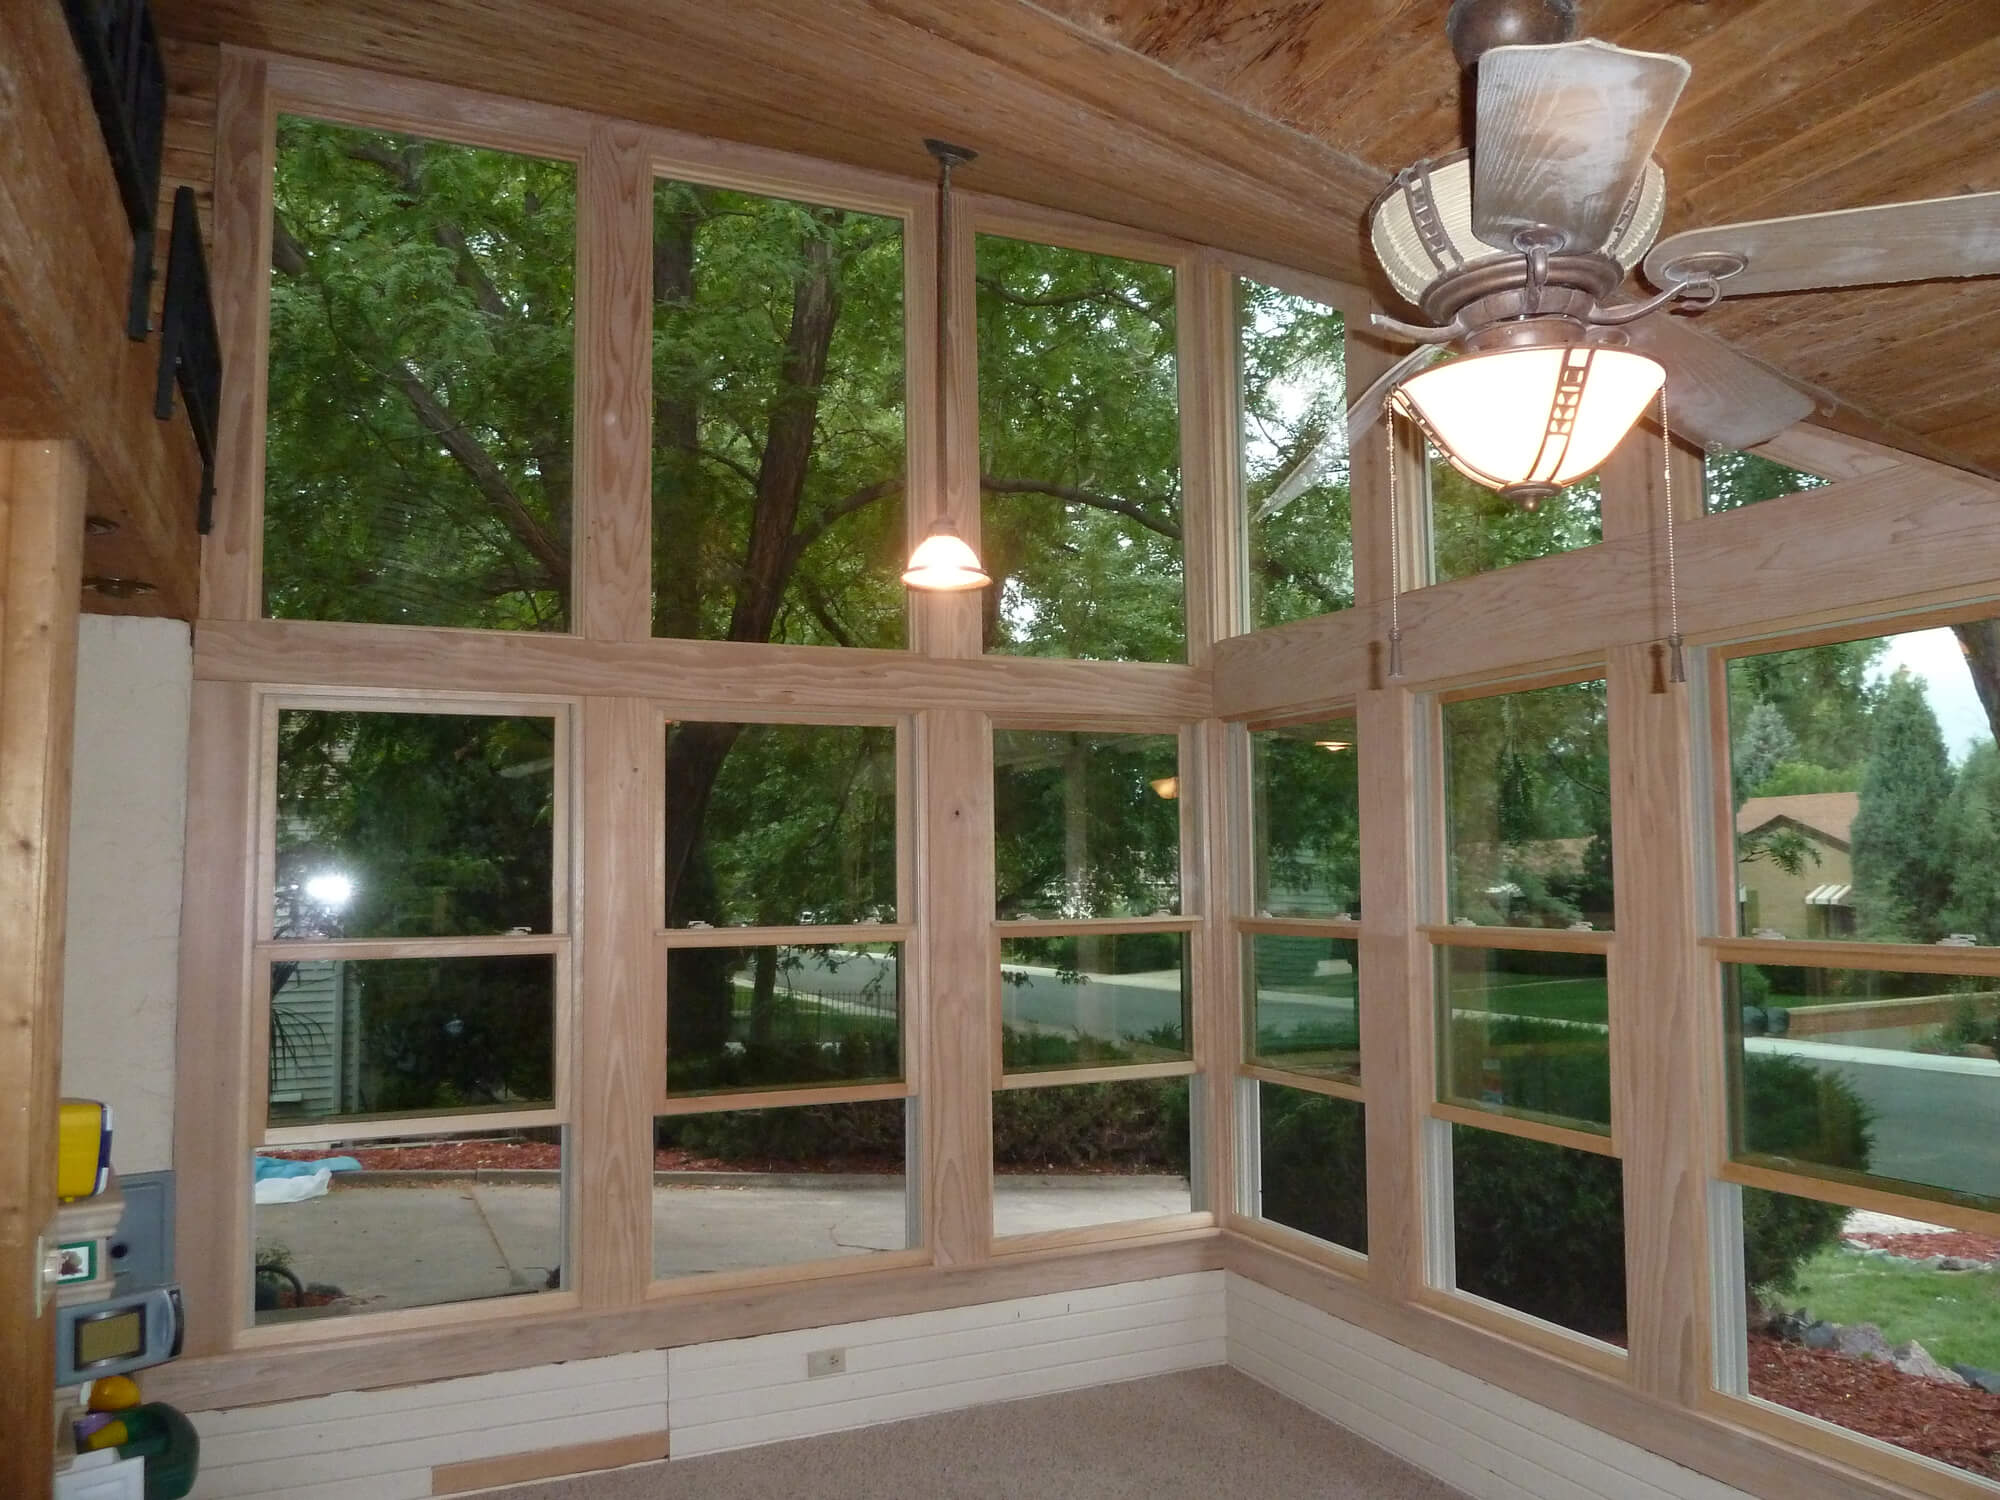 colorado_sunroom_and_window_builder_in_denver.jpg